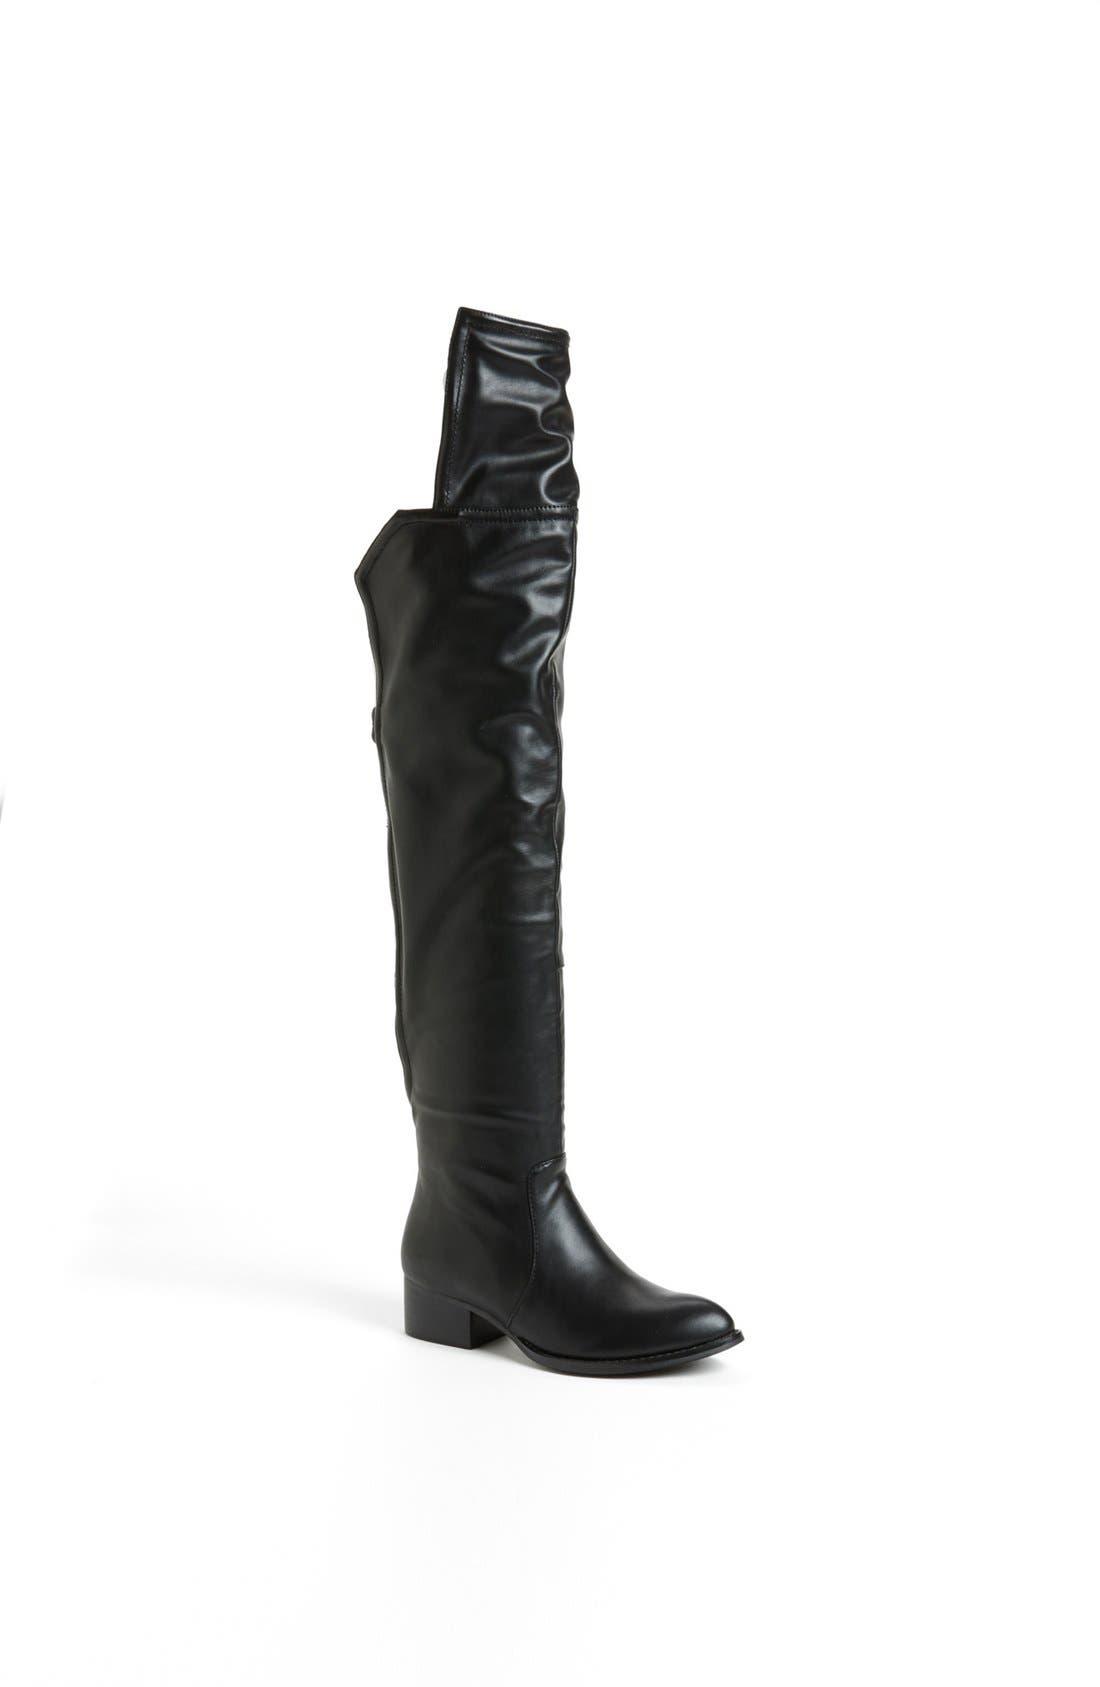 Alternate Image 1 Selected - Jeffrey Campbell 'Backside' Backless Over the Knee Boot